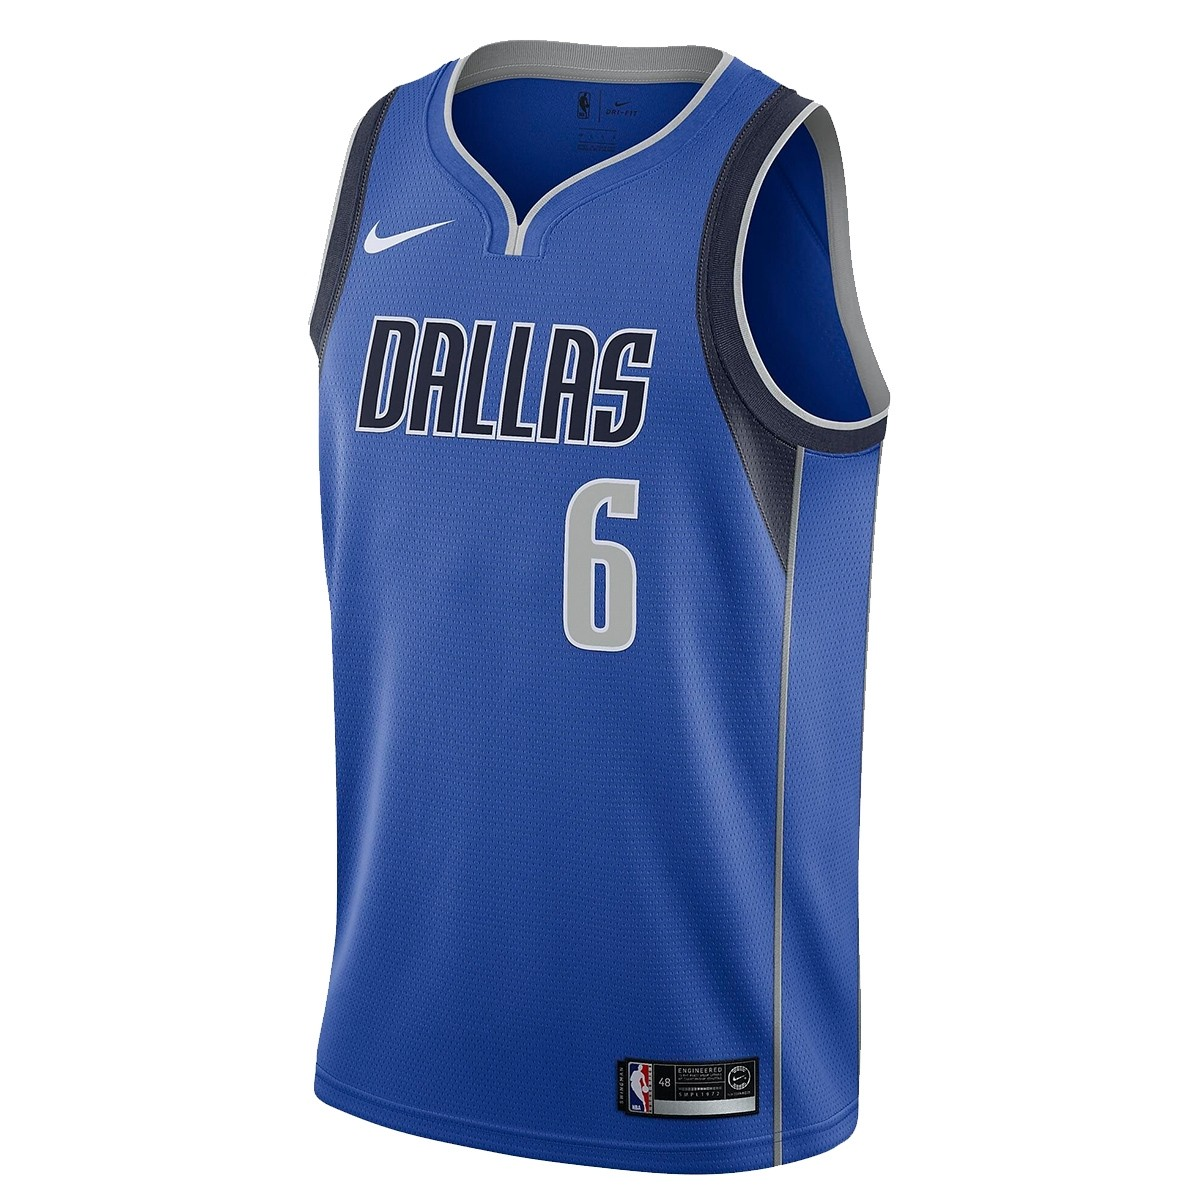 Nike Junior NBA Dallas Swingman Porzingis Jersey 'Icon Edition'